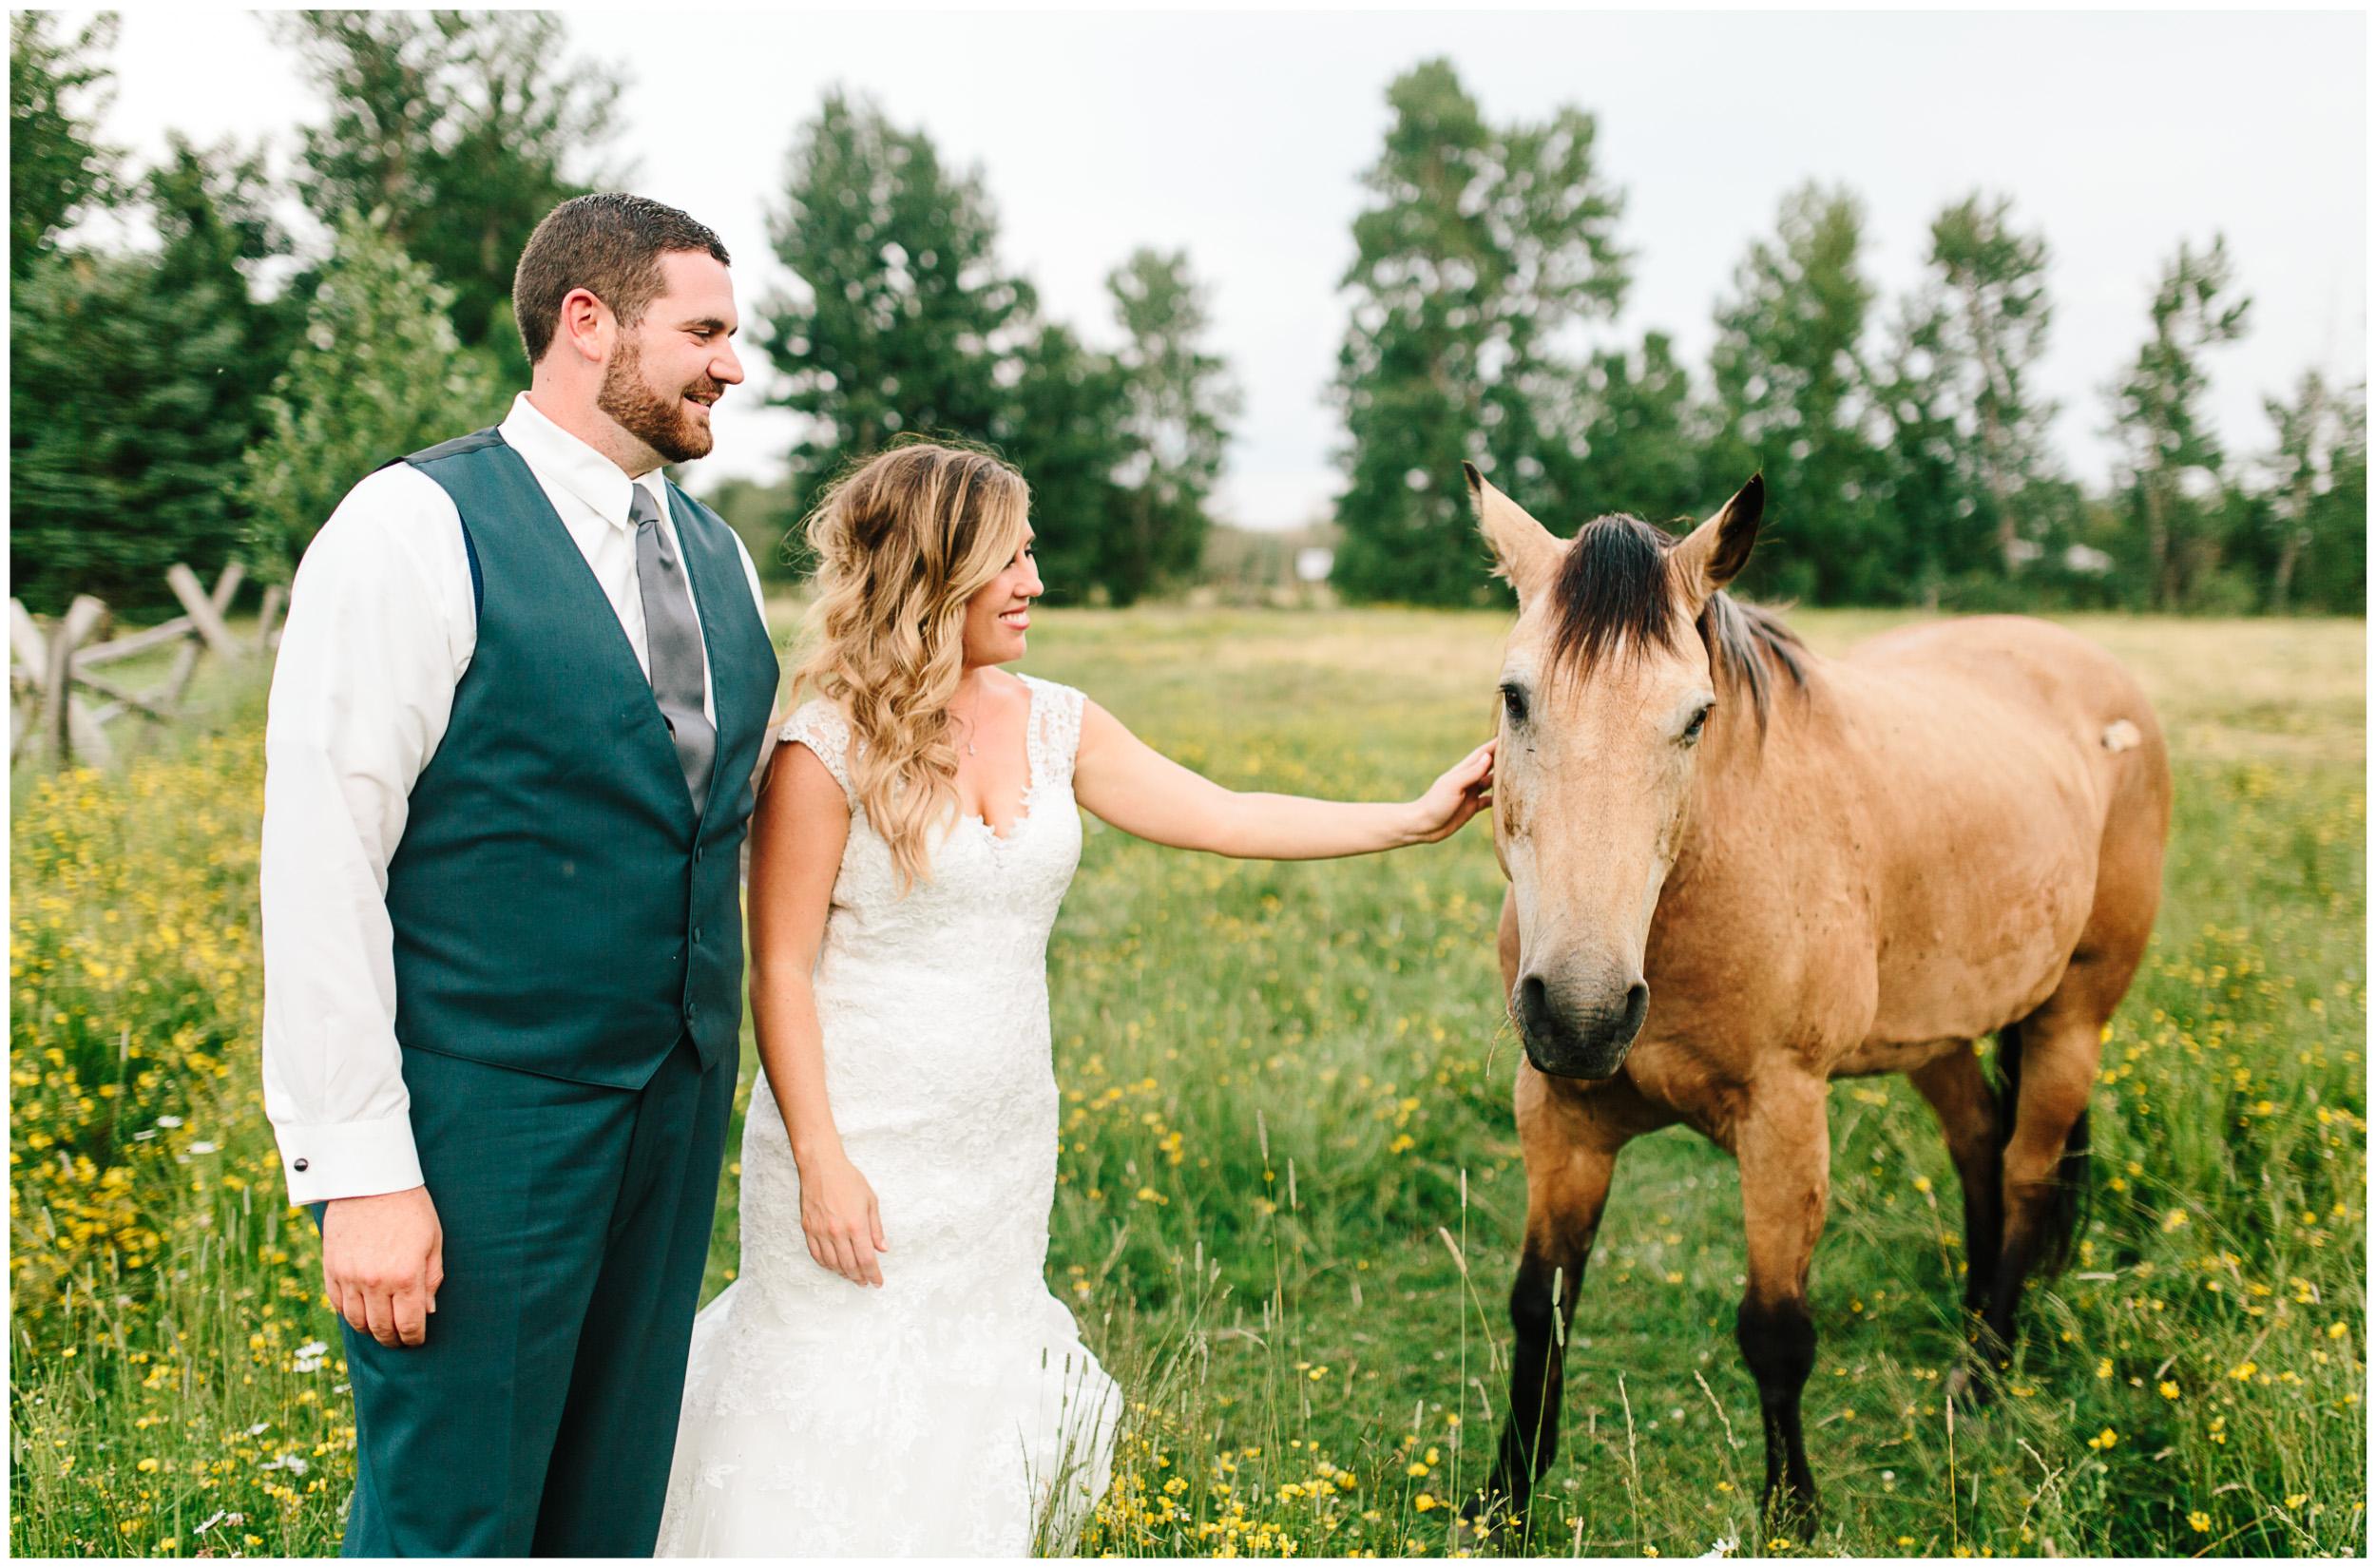 redlodge_montana_wedding_37.jpg